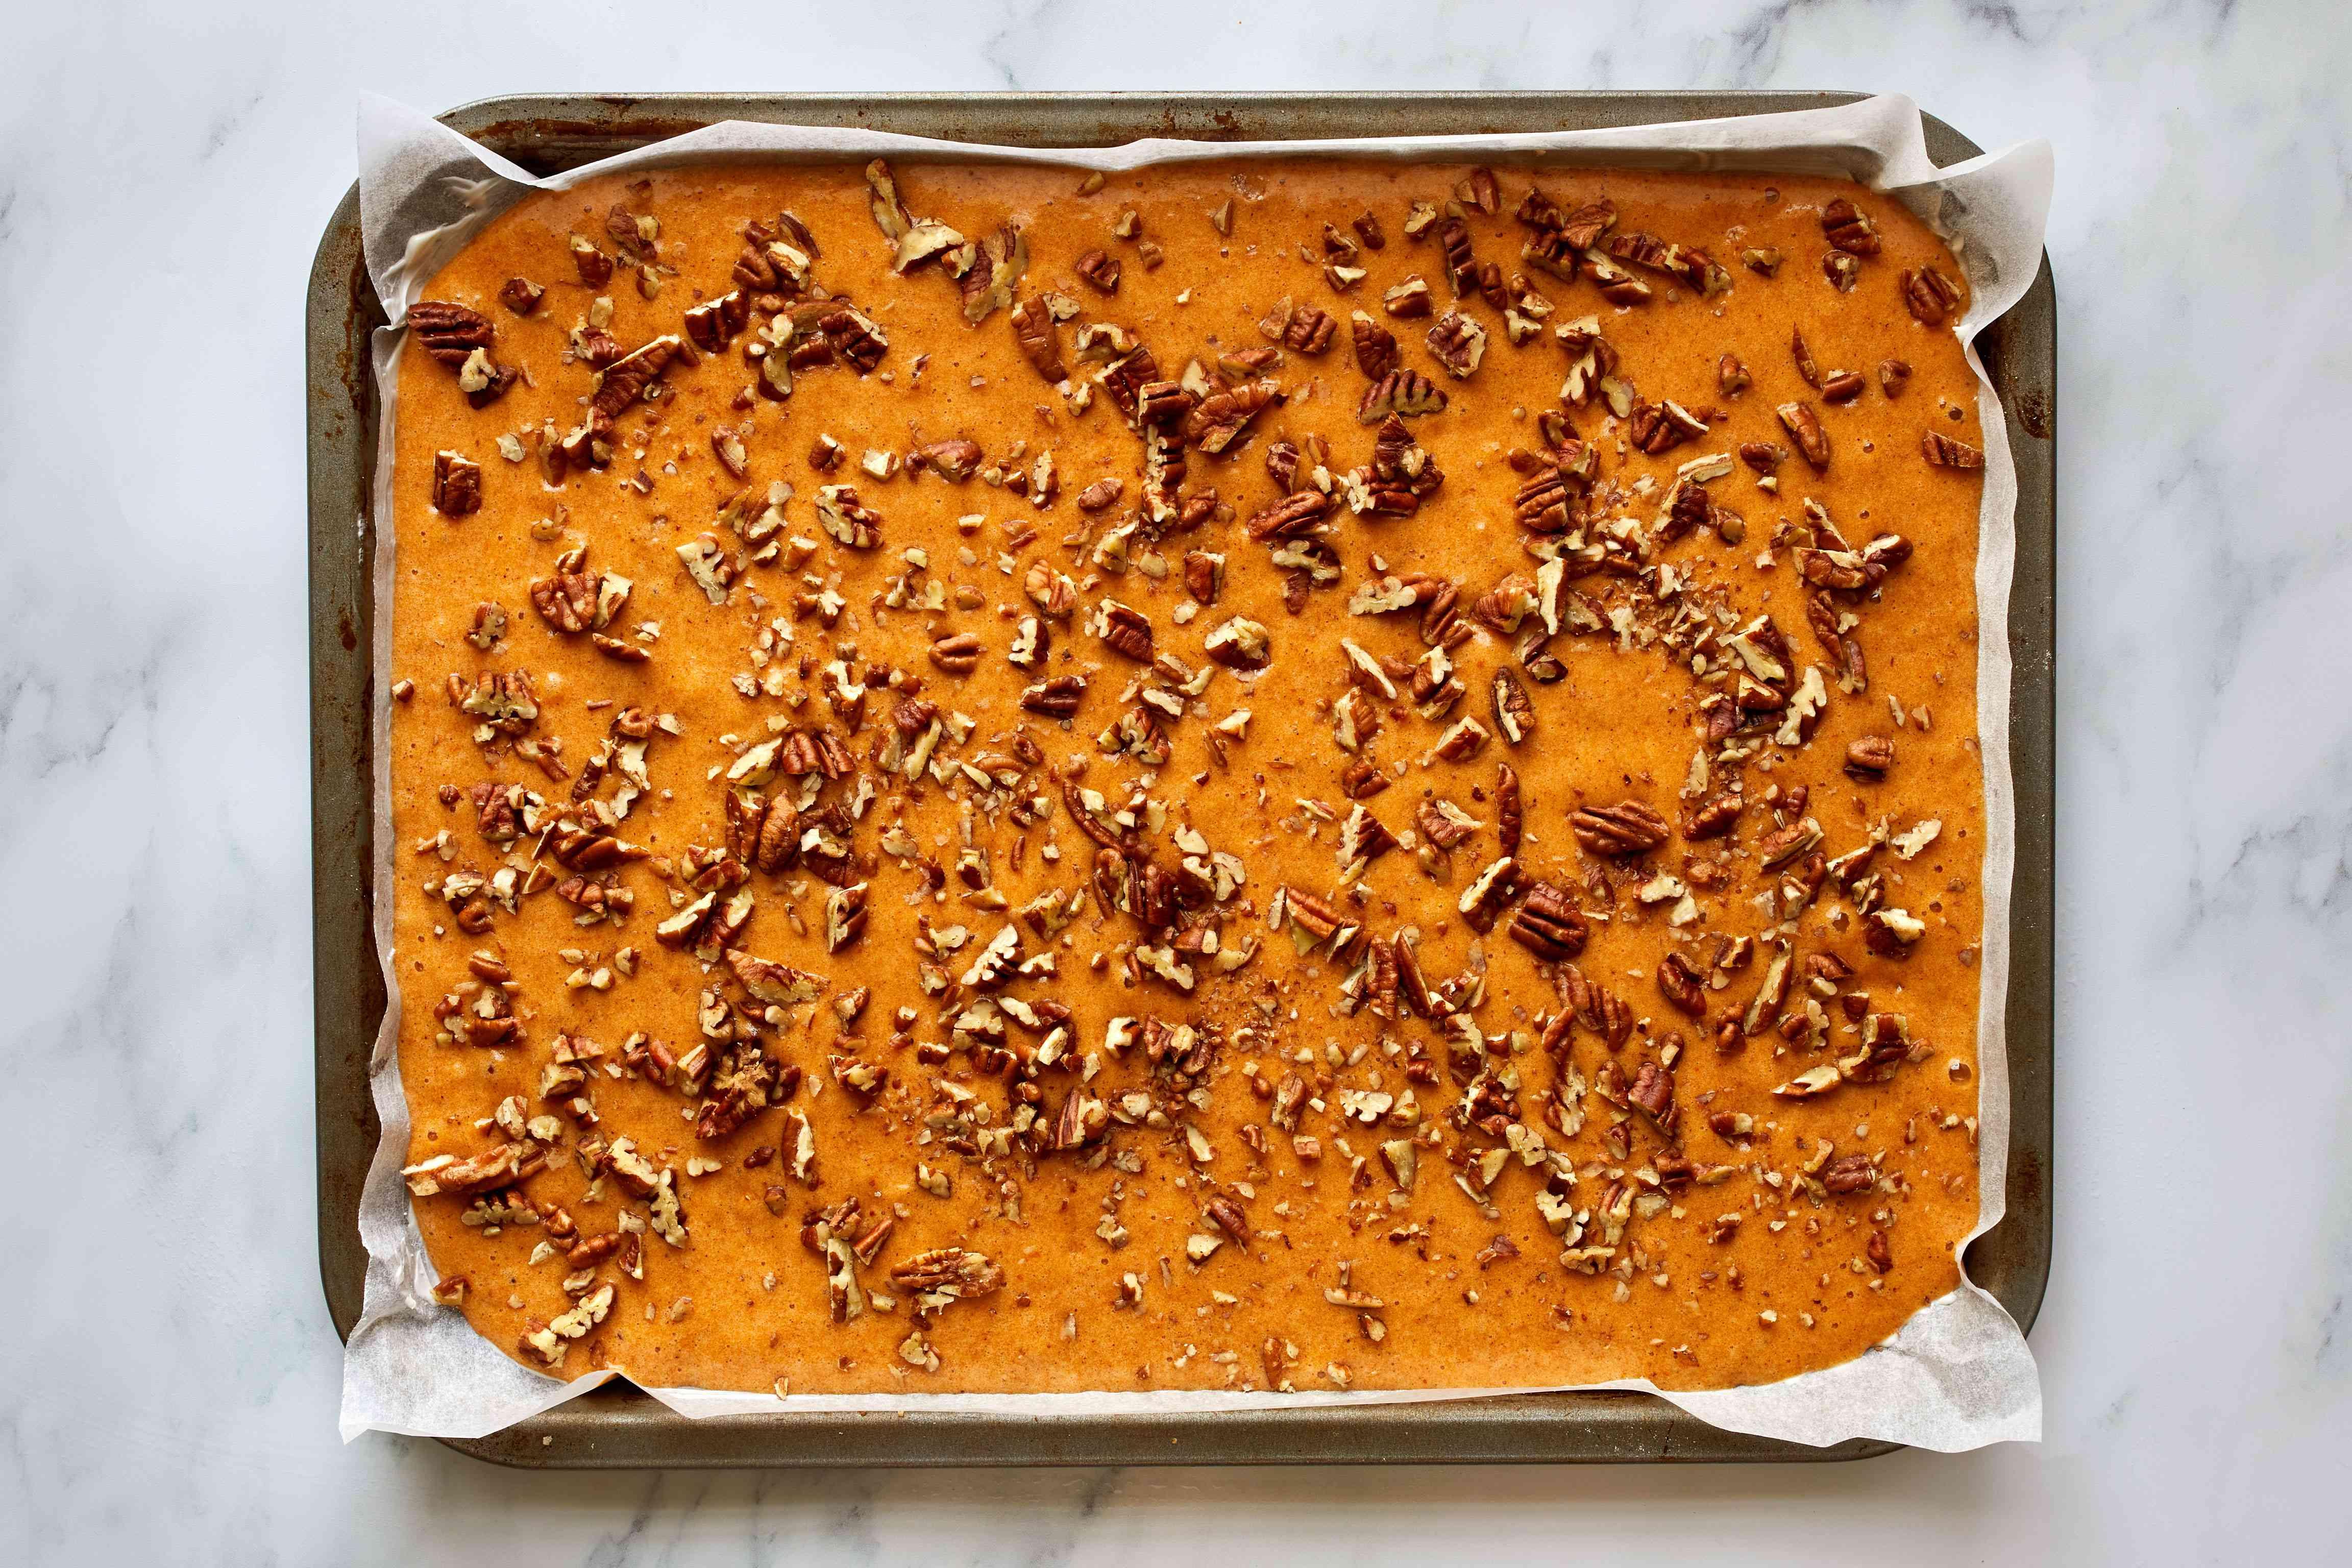 pumpkin cake batter on a baking sheet with pecans sprinkled on top